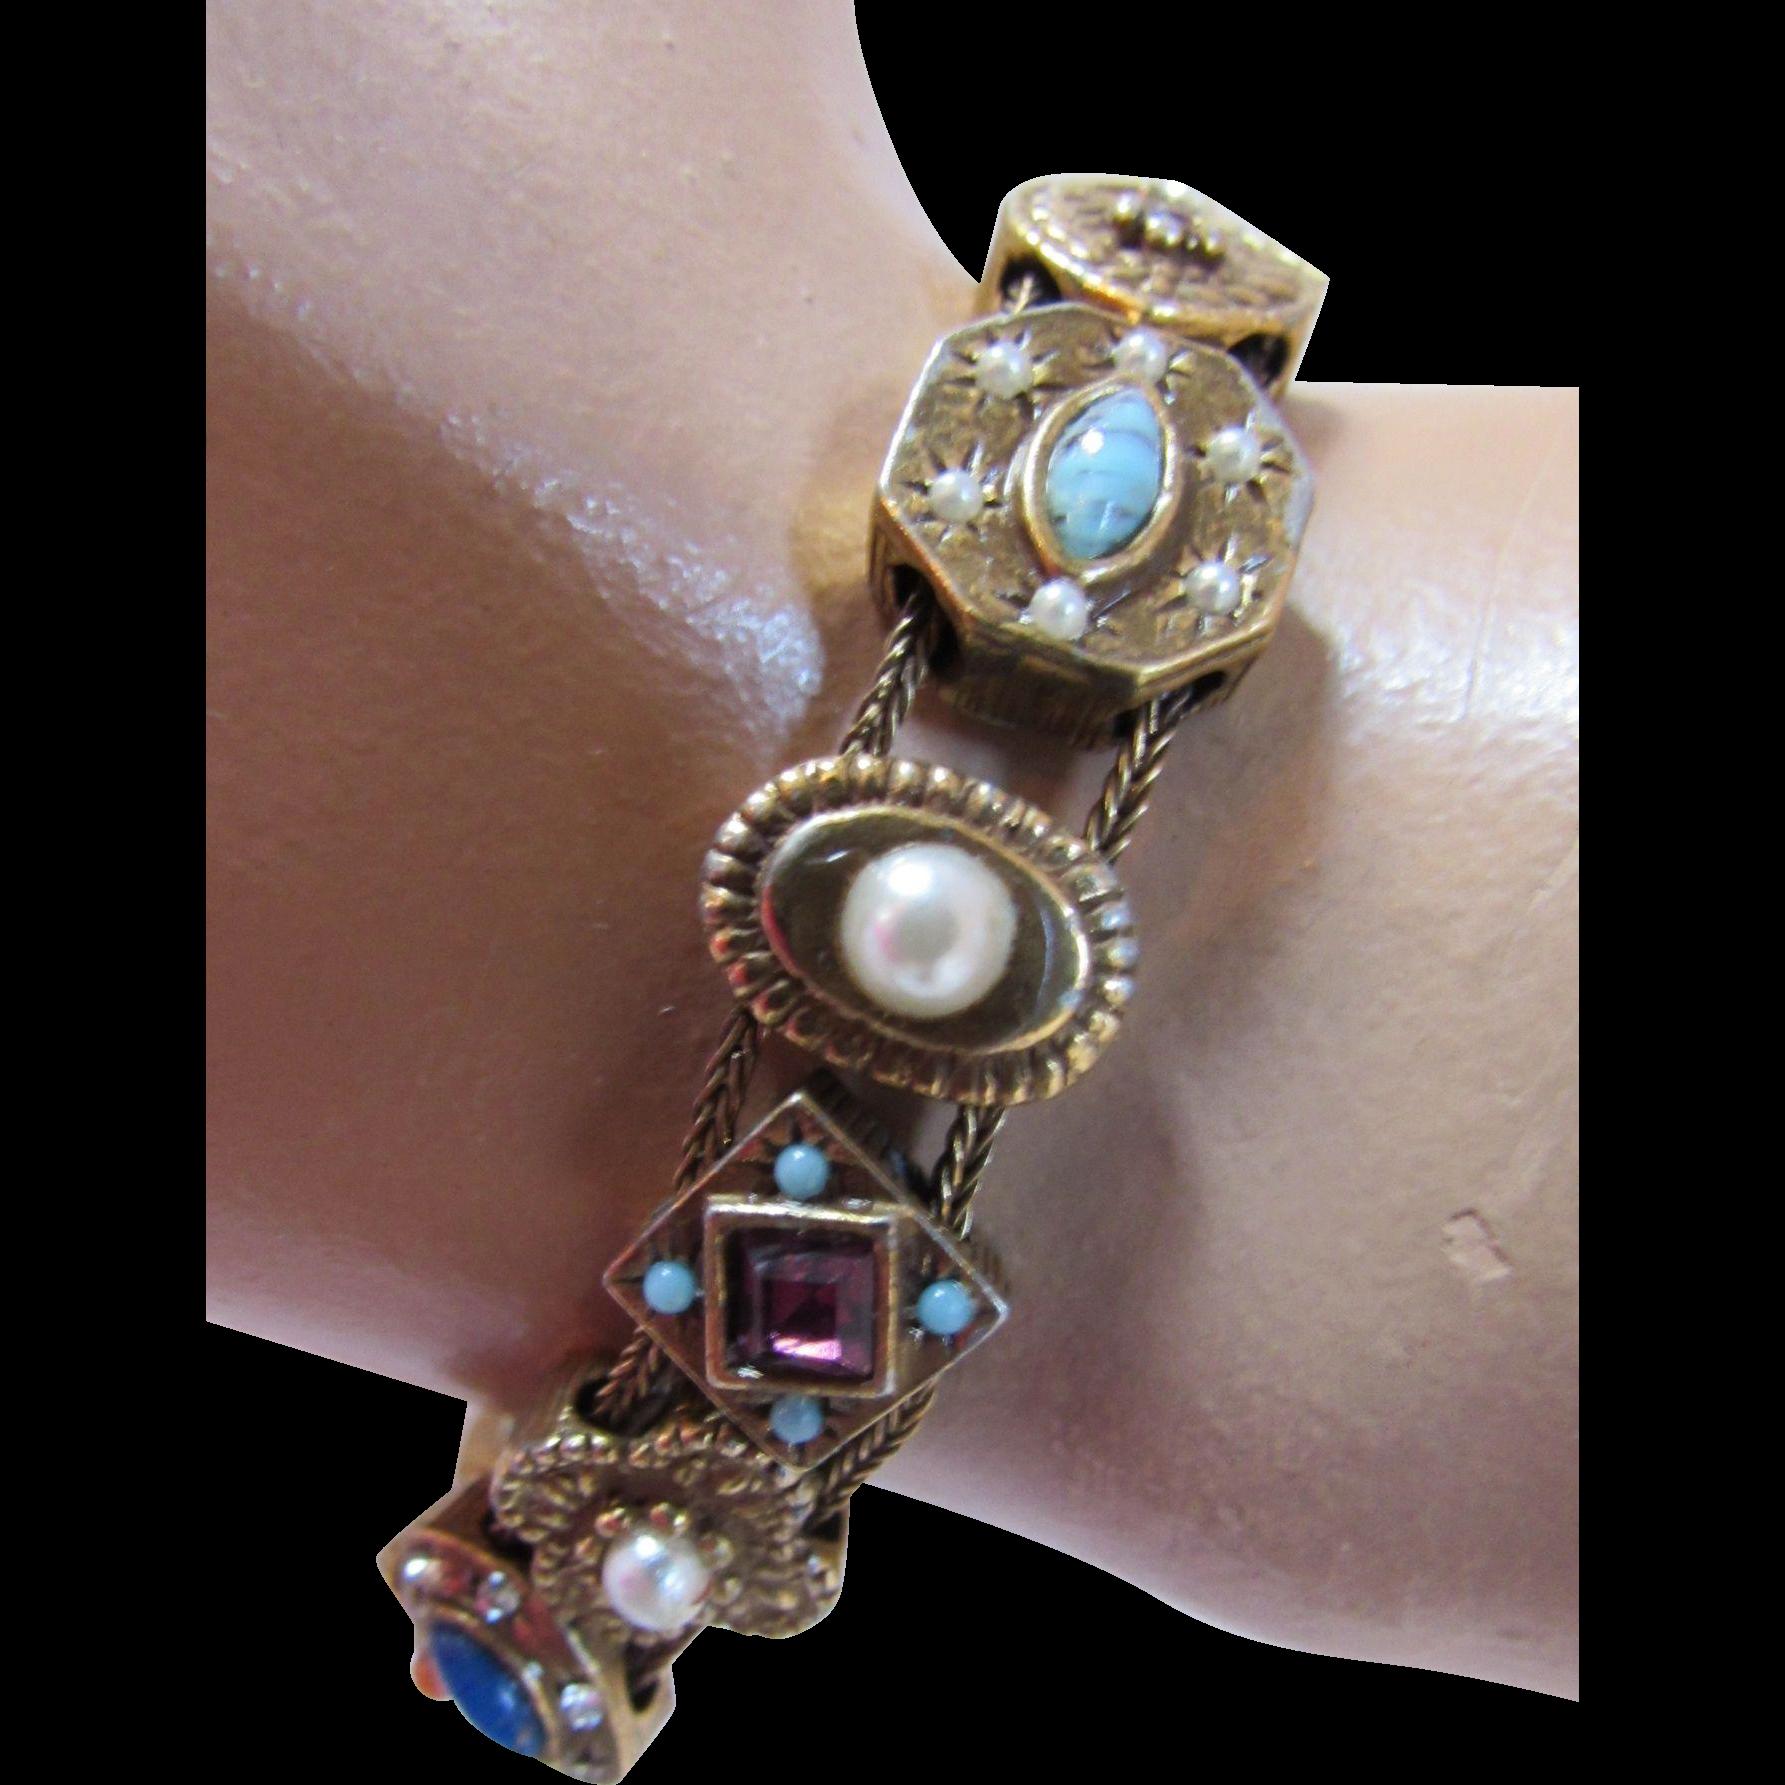 Goldette Slide Bracelet with 14 Links in Varied Themes Mid Century